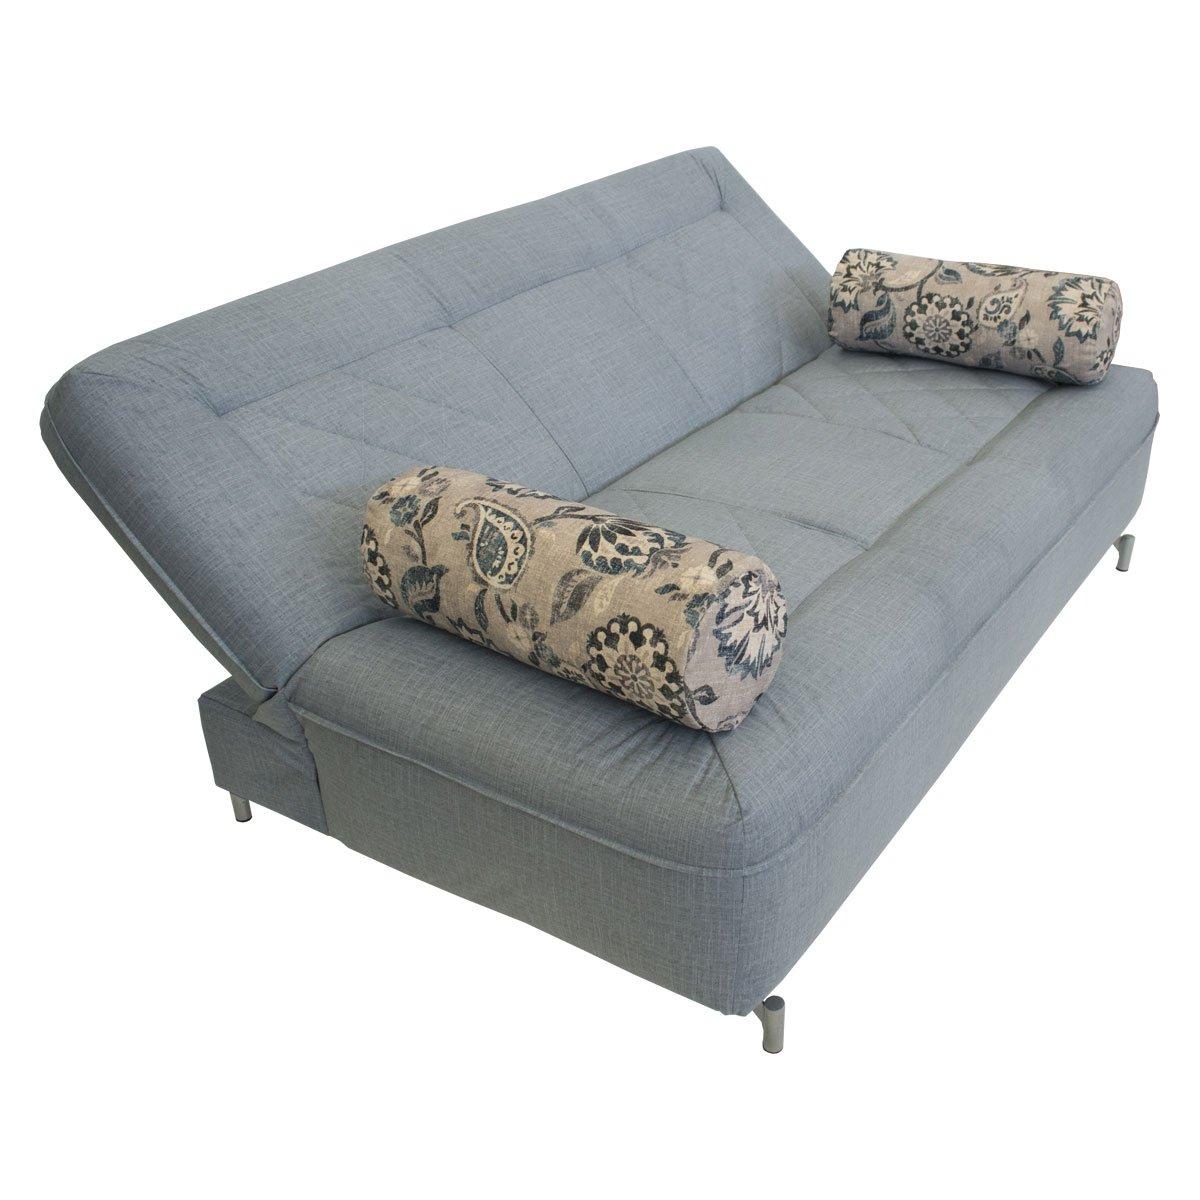 abrir sofa cama beddinge disney flip out australia sofá sara azul violanti sears com mx me entiende